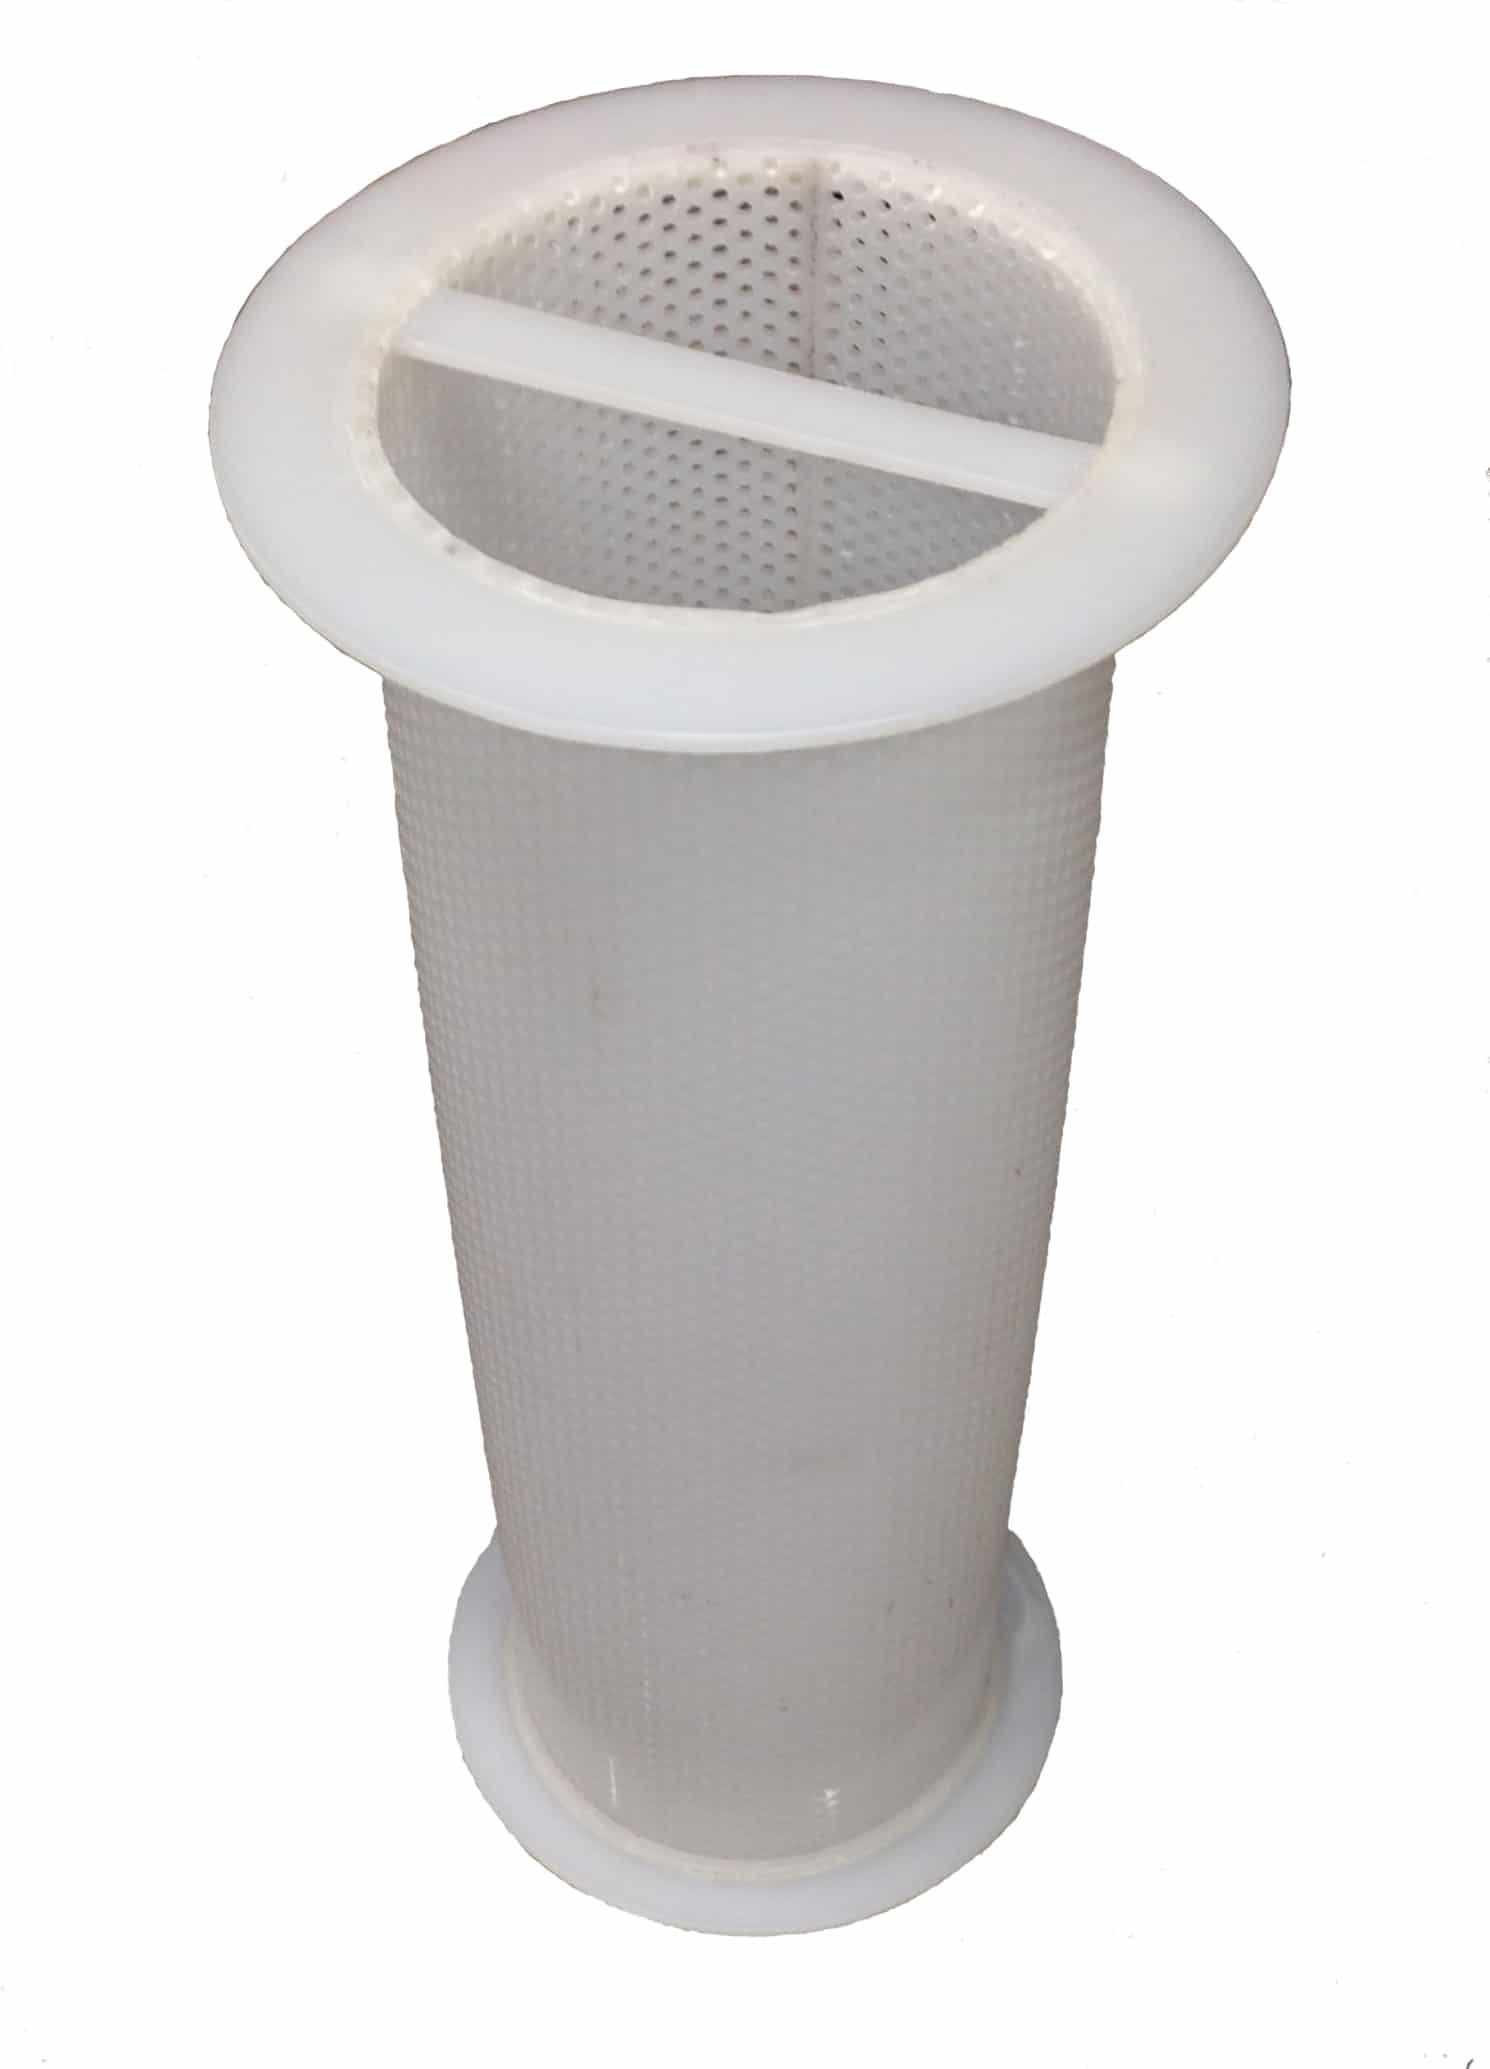 Thermoplastic Wye Strainer Basket